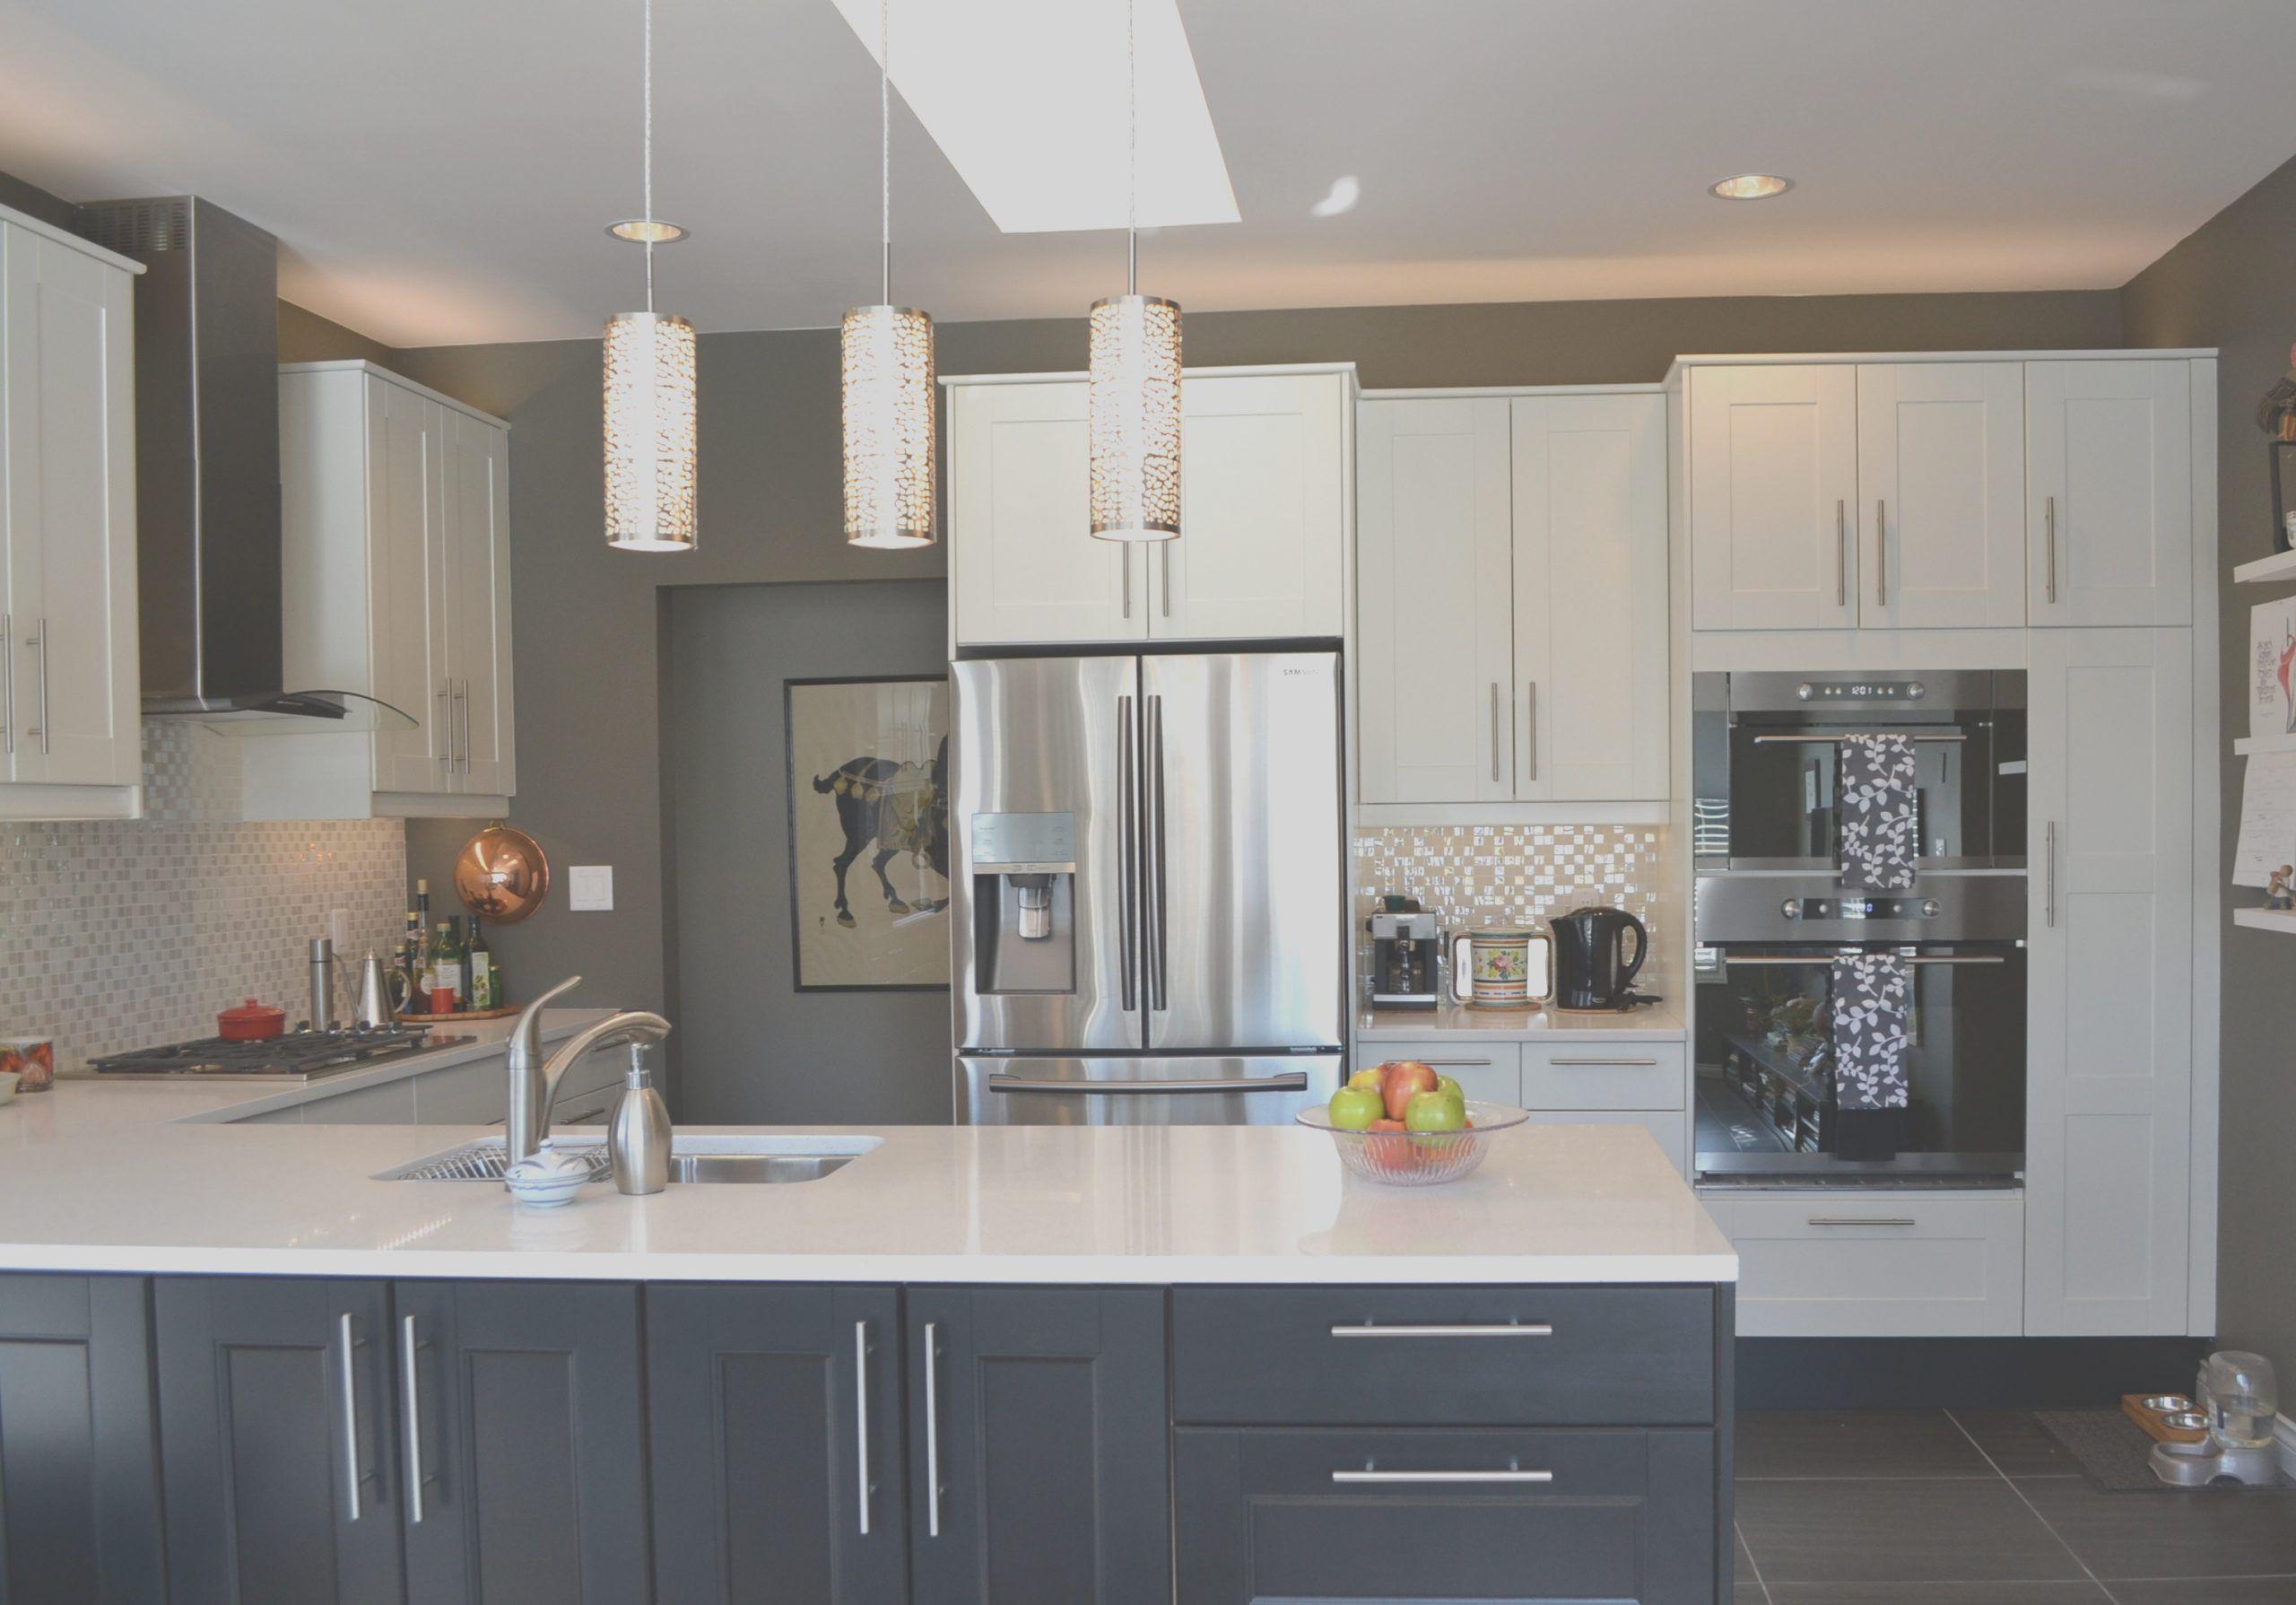 10 Outstanding Grimslov Kitchen Gallery in 10  Ikea kitchen